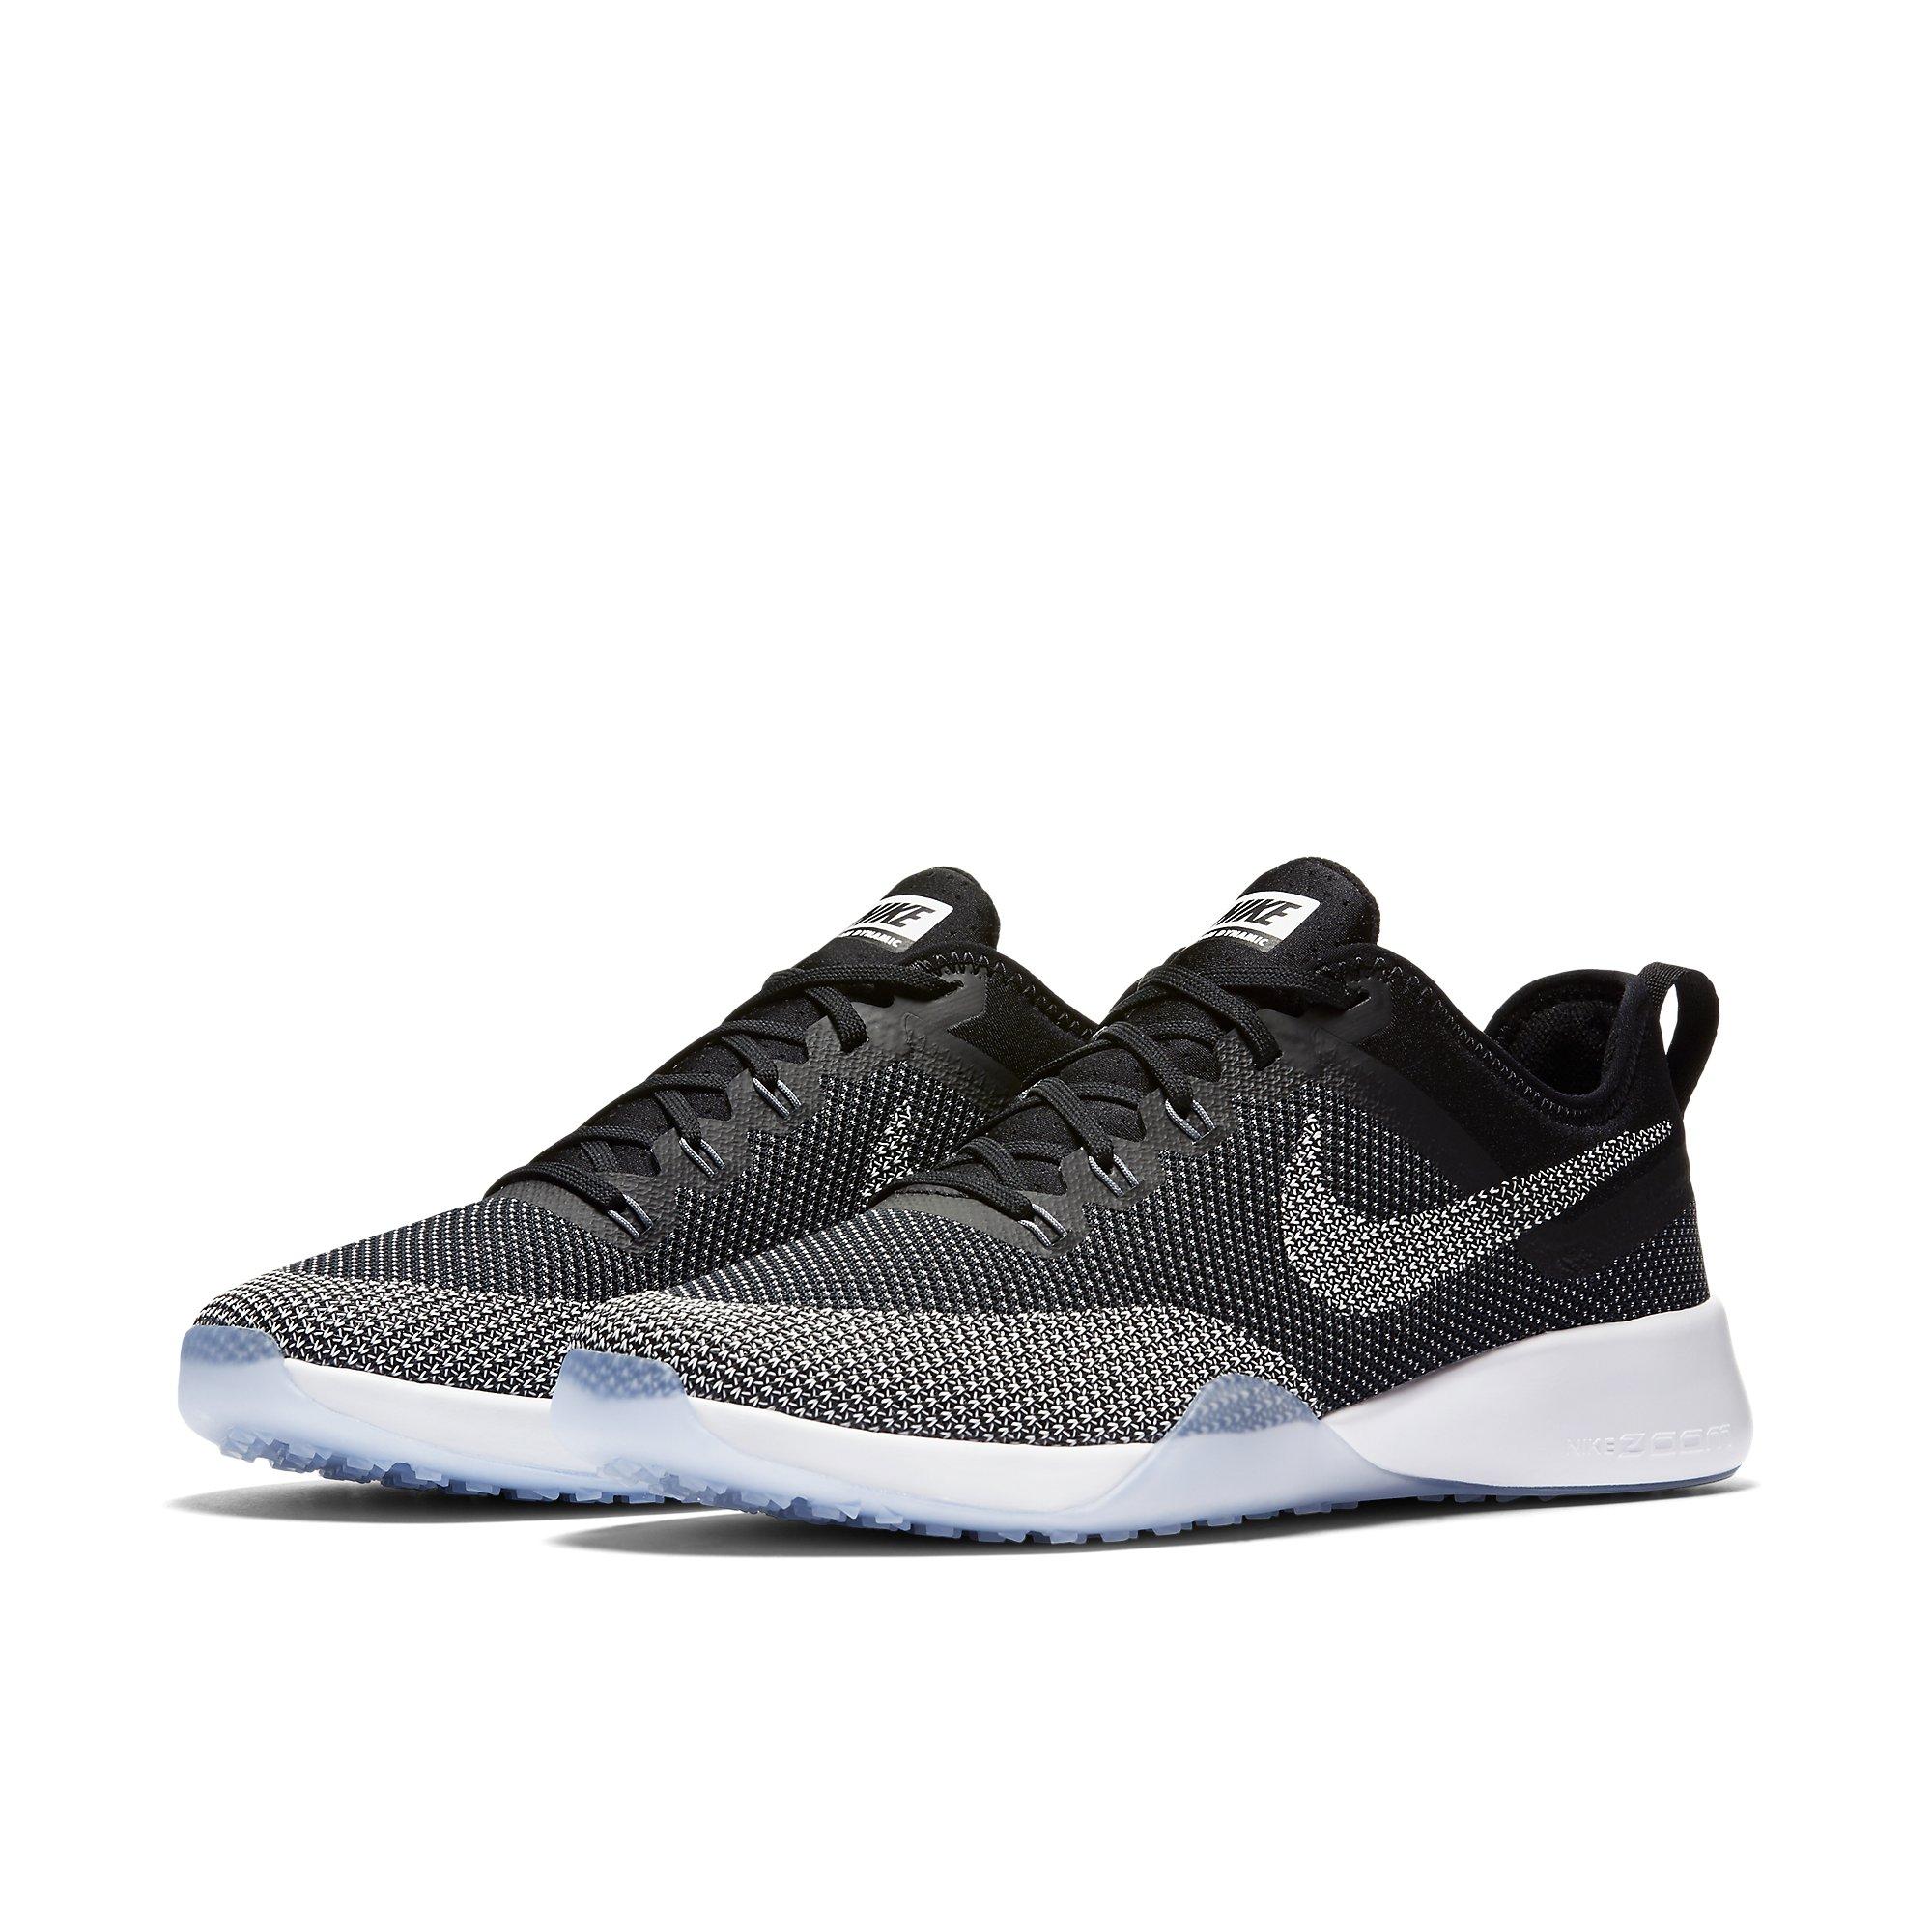 Chaussure de training Nike Air Zoom Dynamic TR pour Femme